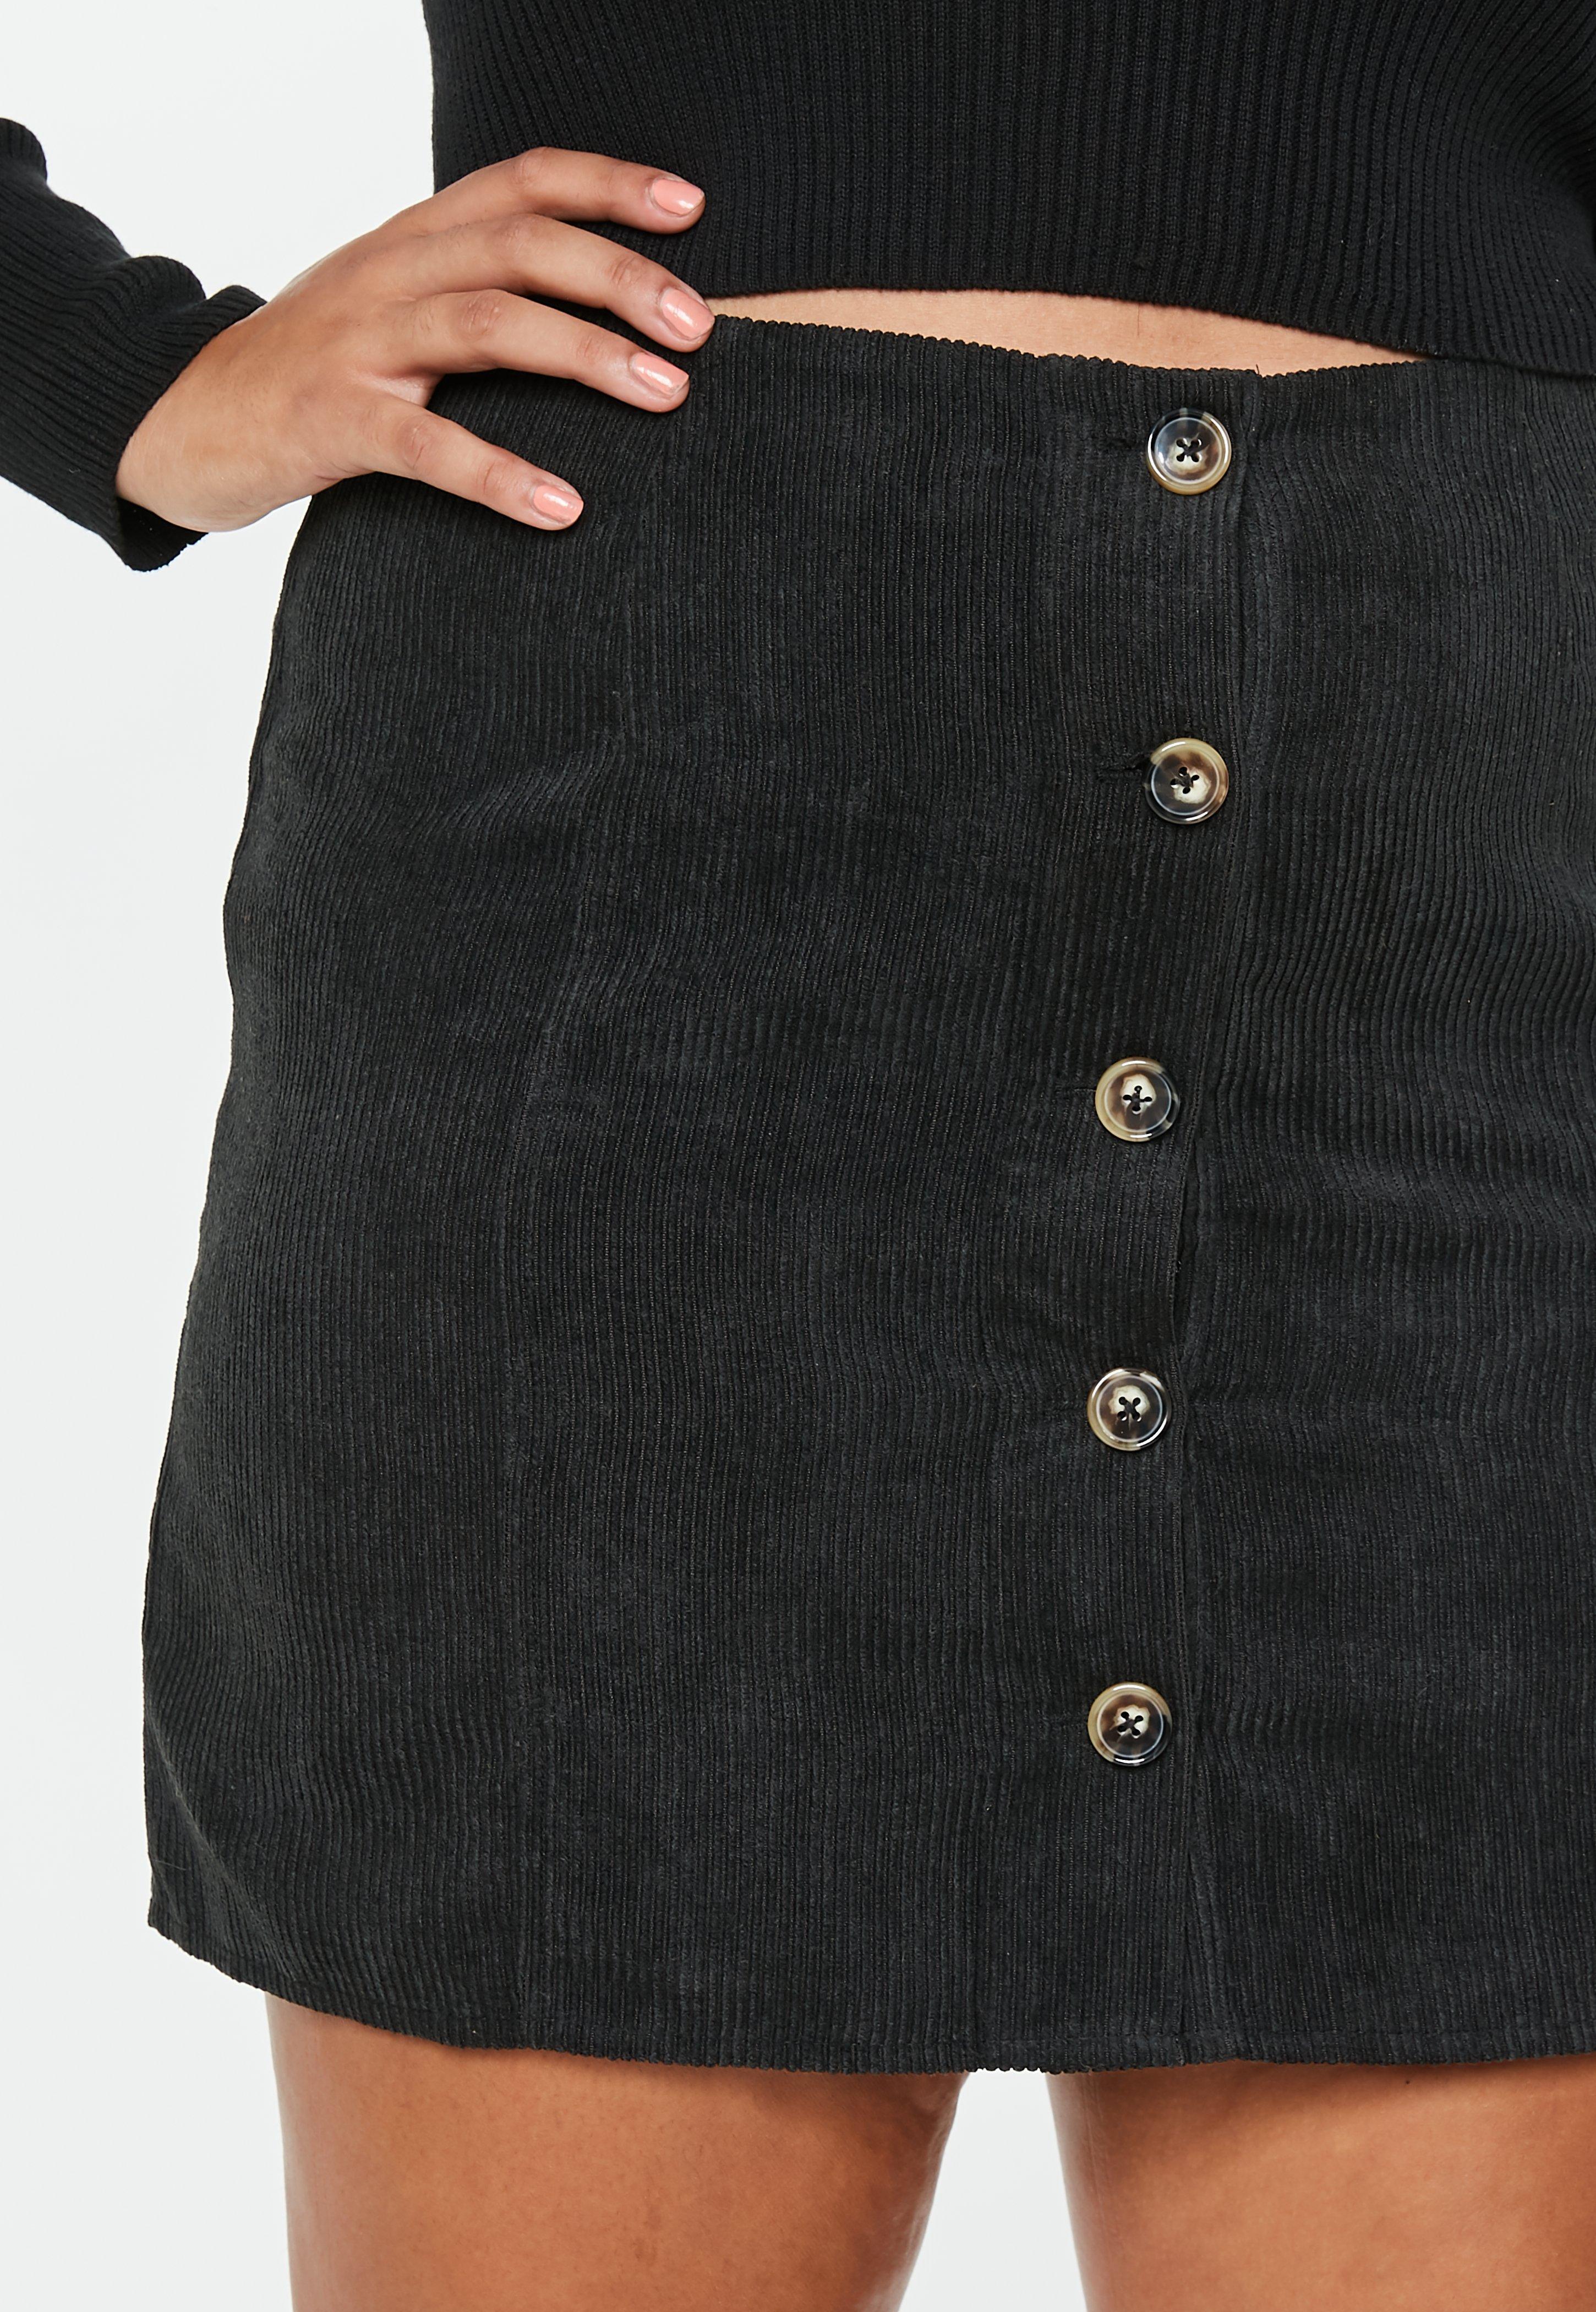 aceab57e91 Lyst - Missguided Plus Size Black Button Through Cord Mini Skirt in ...